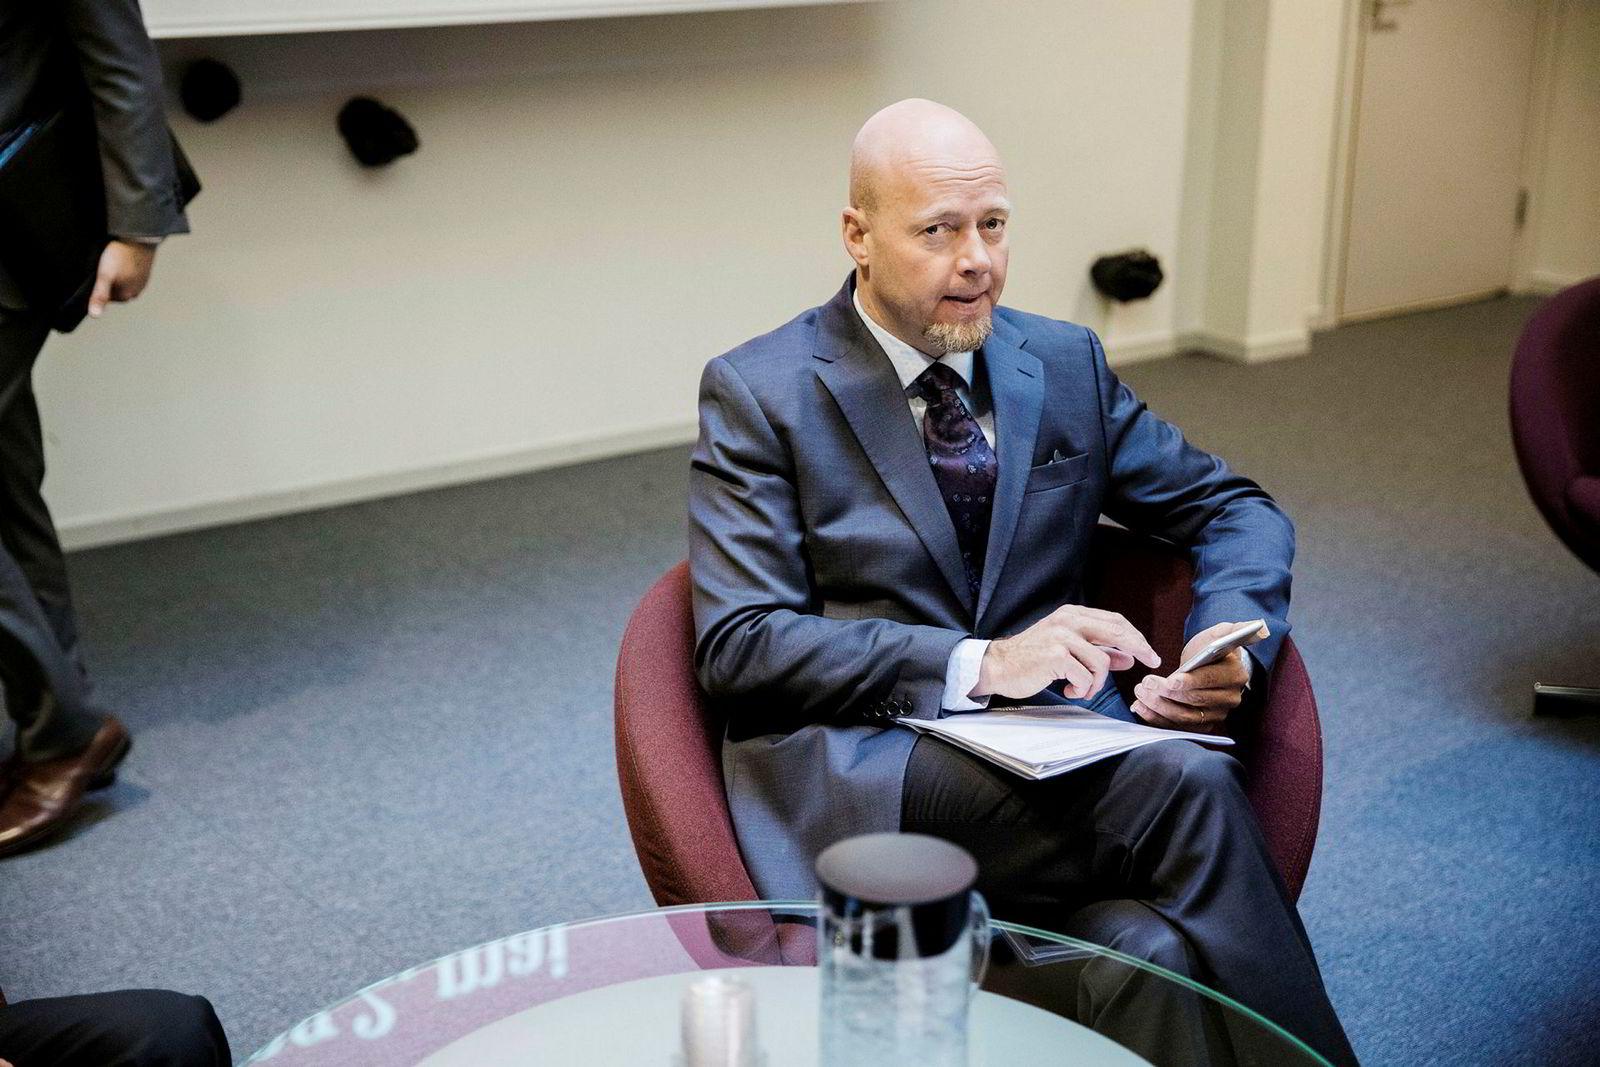 Oljefondssjef Yngve Slyngstad var på plass tirsdag under den årlige stortingshøringen om Oljefondet i finanskomiteen. Foto: